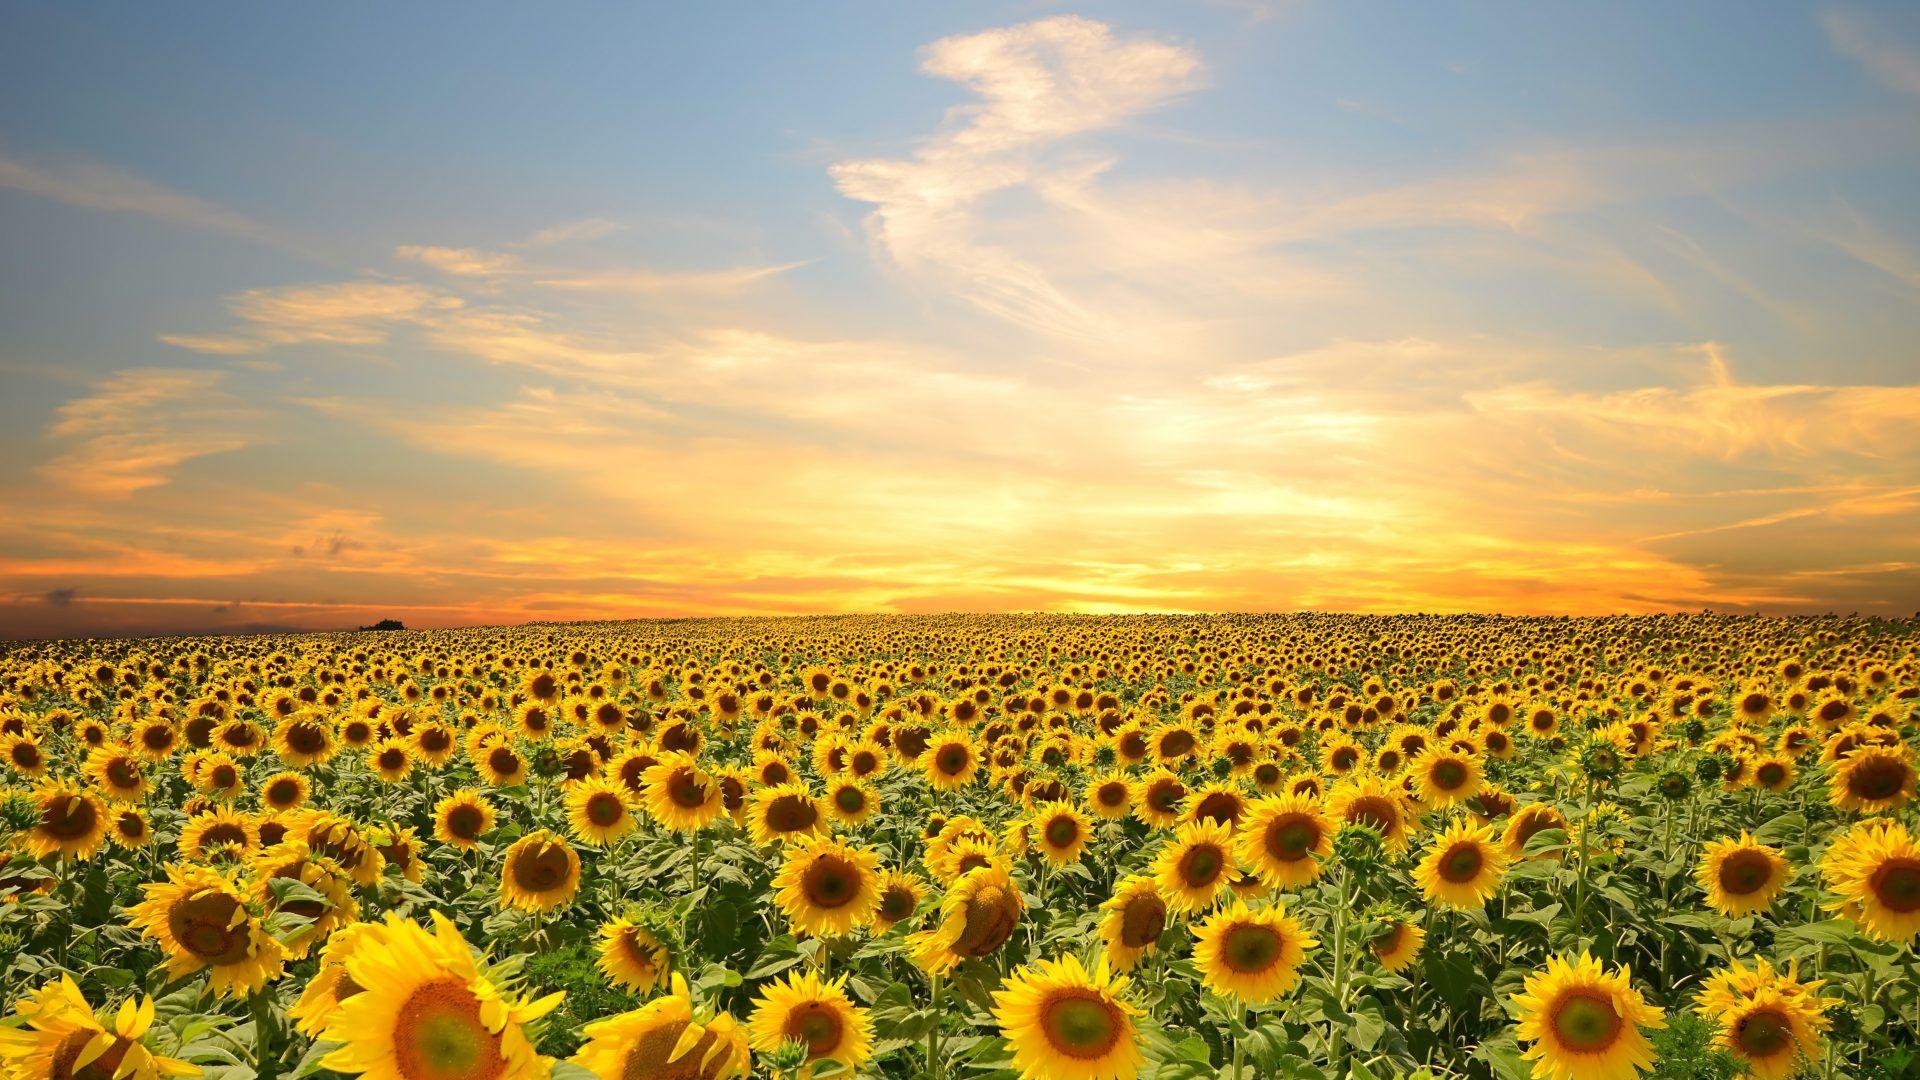 Pin By Ashley Marie On Beautiful World Sunflower Wallpaper Nature Photography Field Wallpaper